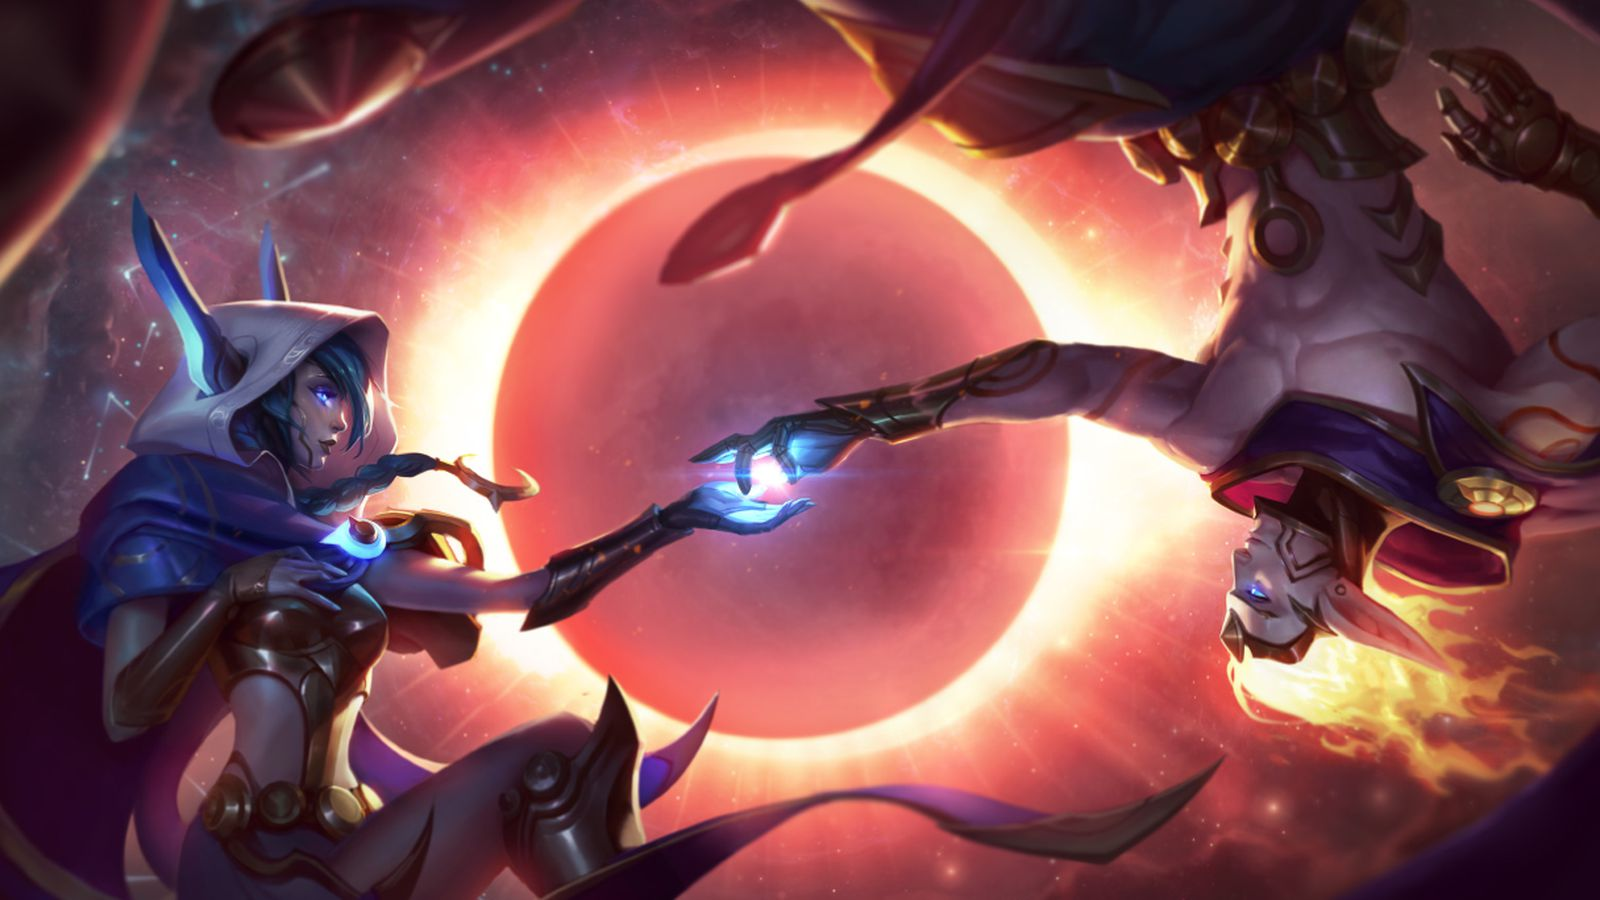 Xayah And Rakan Release Skins Cosmic Dusk And Dawn Join Cosmic